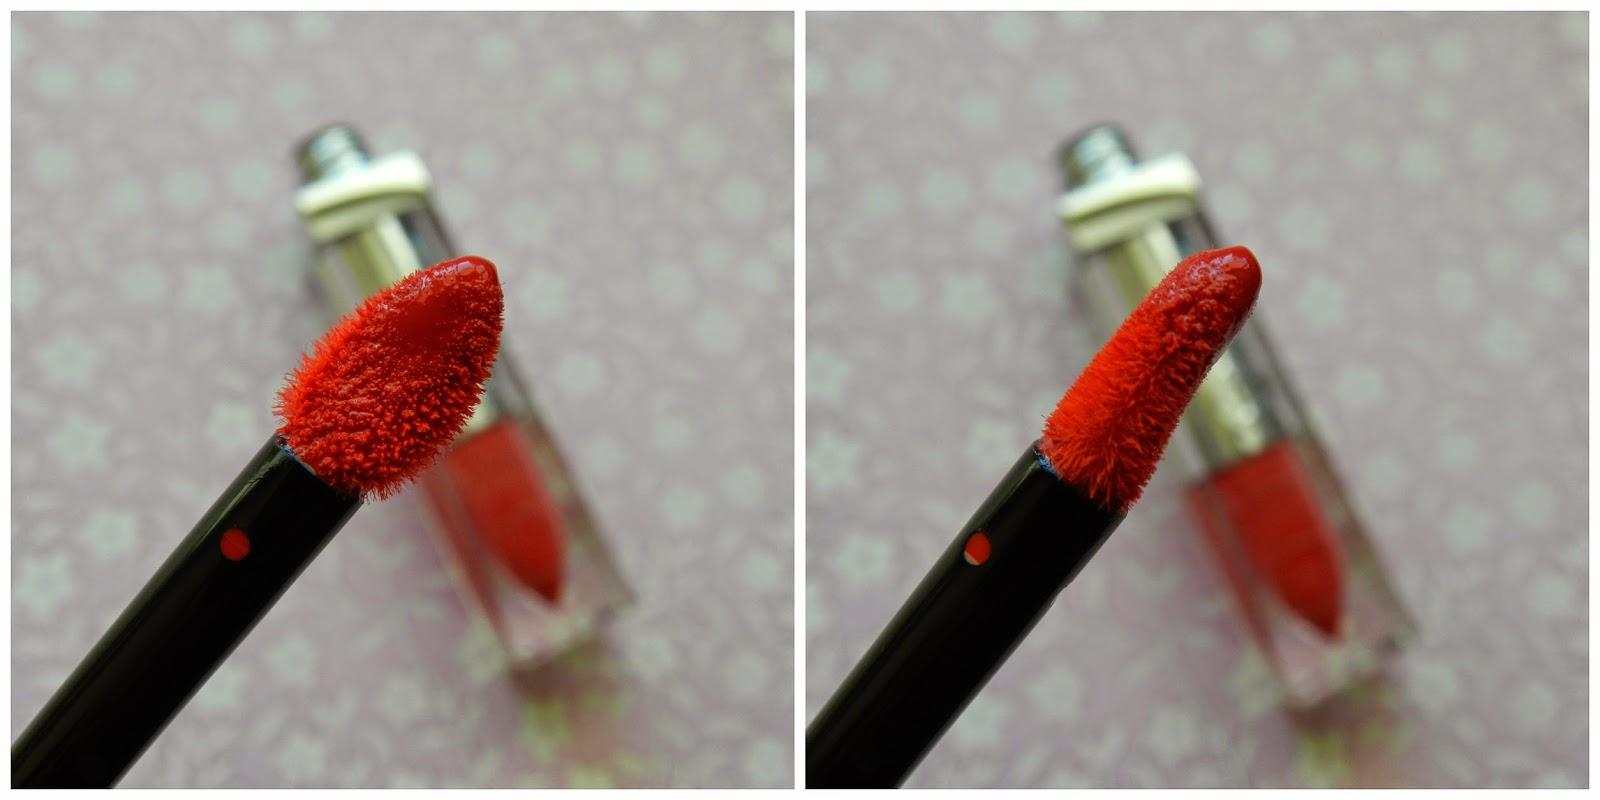 Addict Fluid Stick by Dior #14